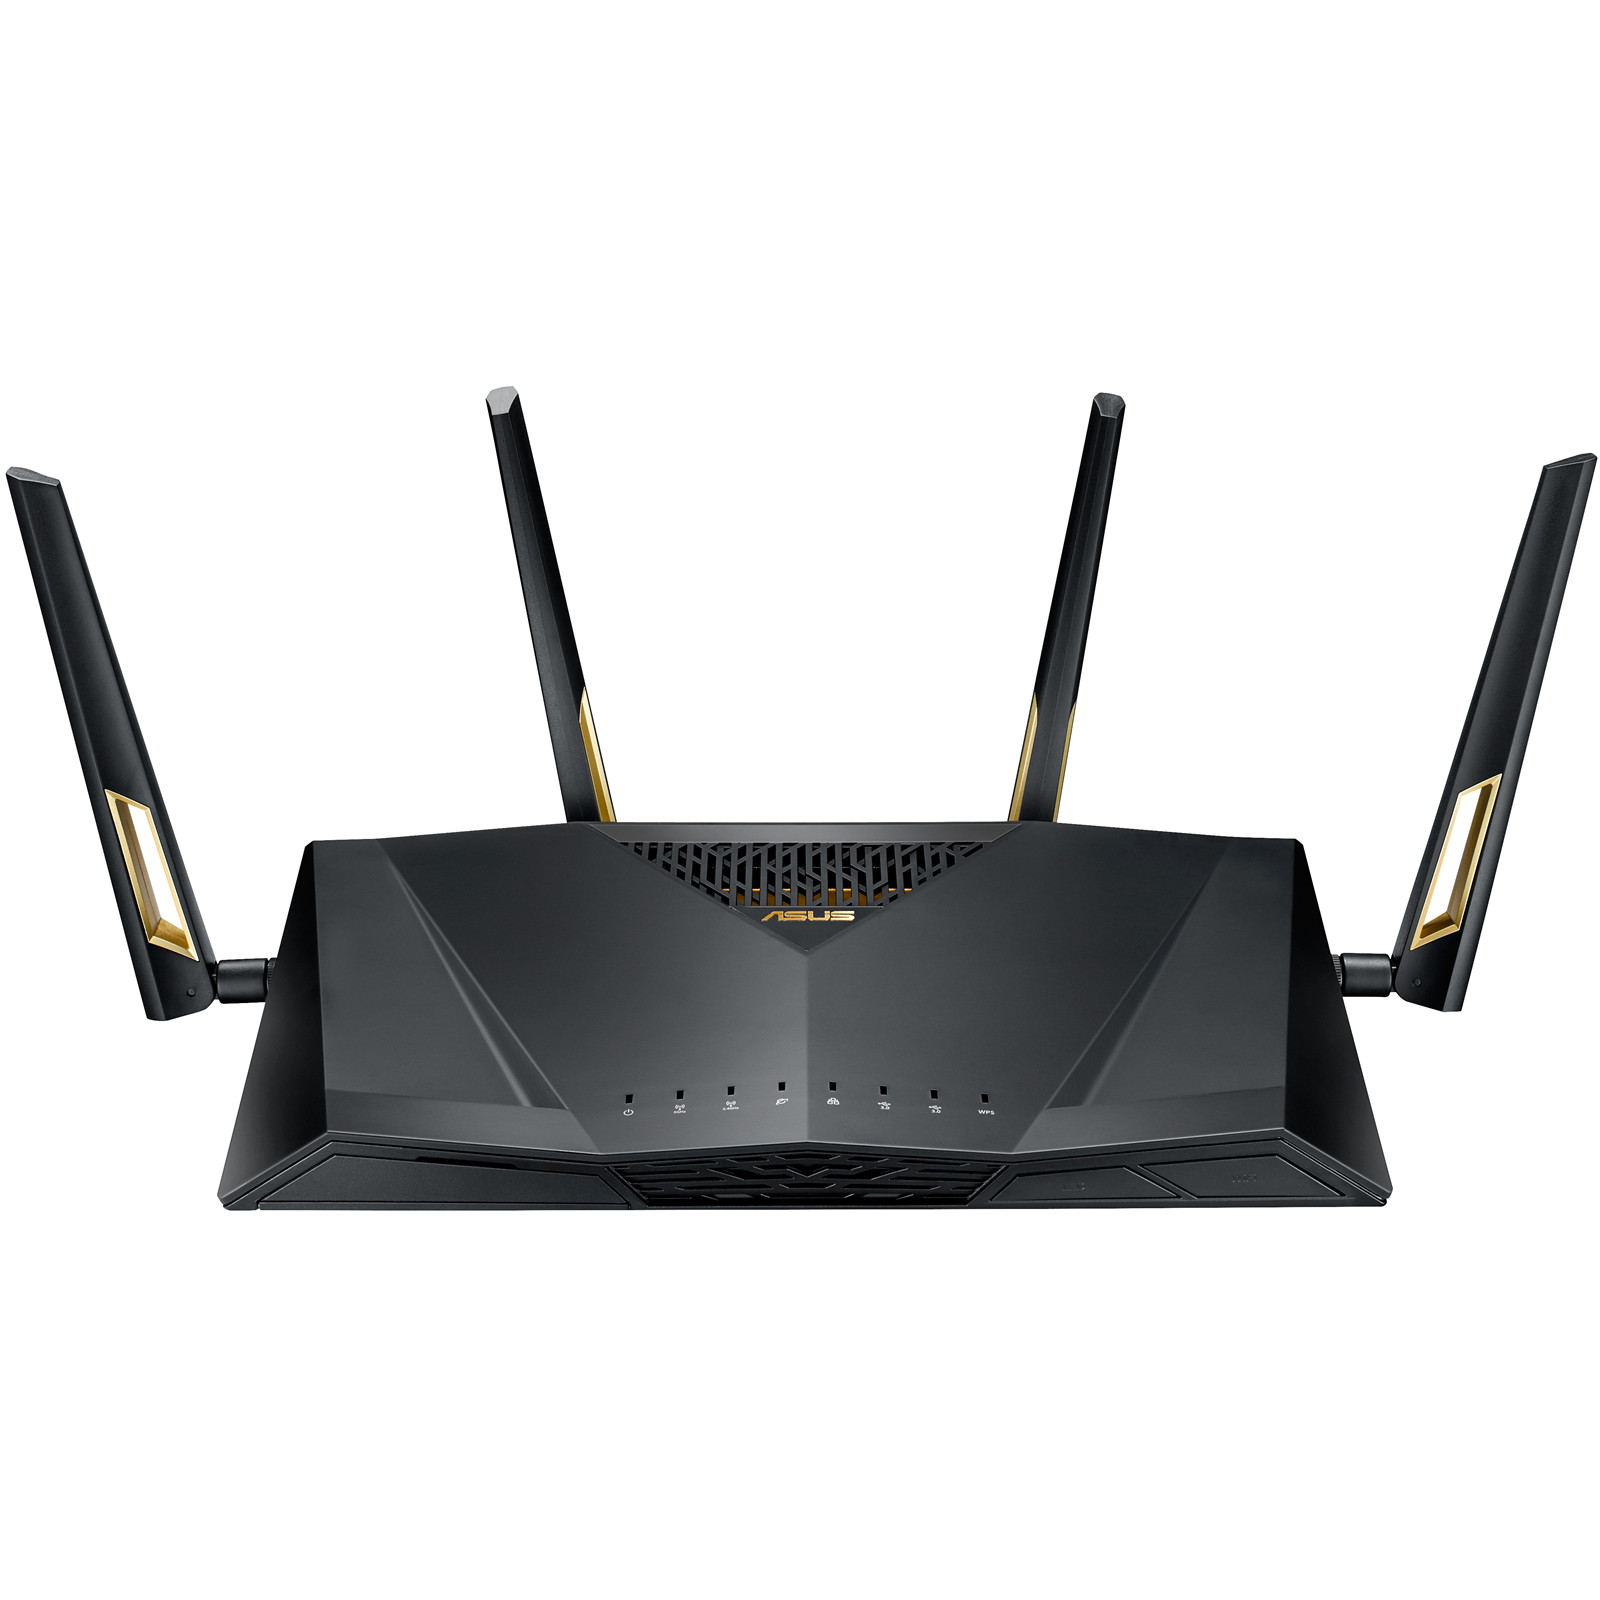 Asus RTAX88U AX6000 Router